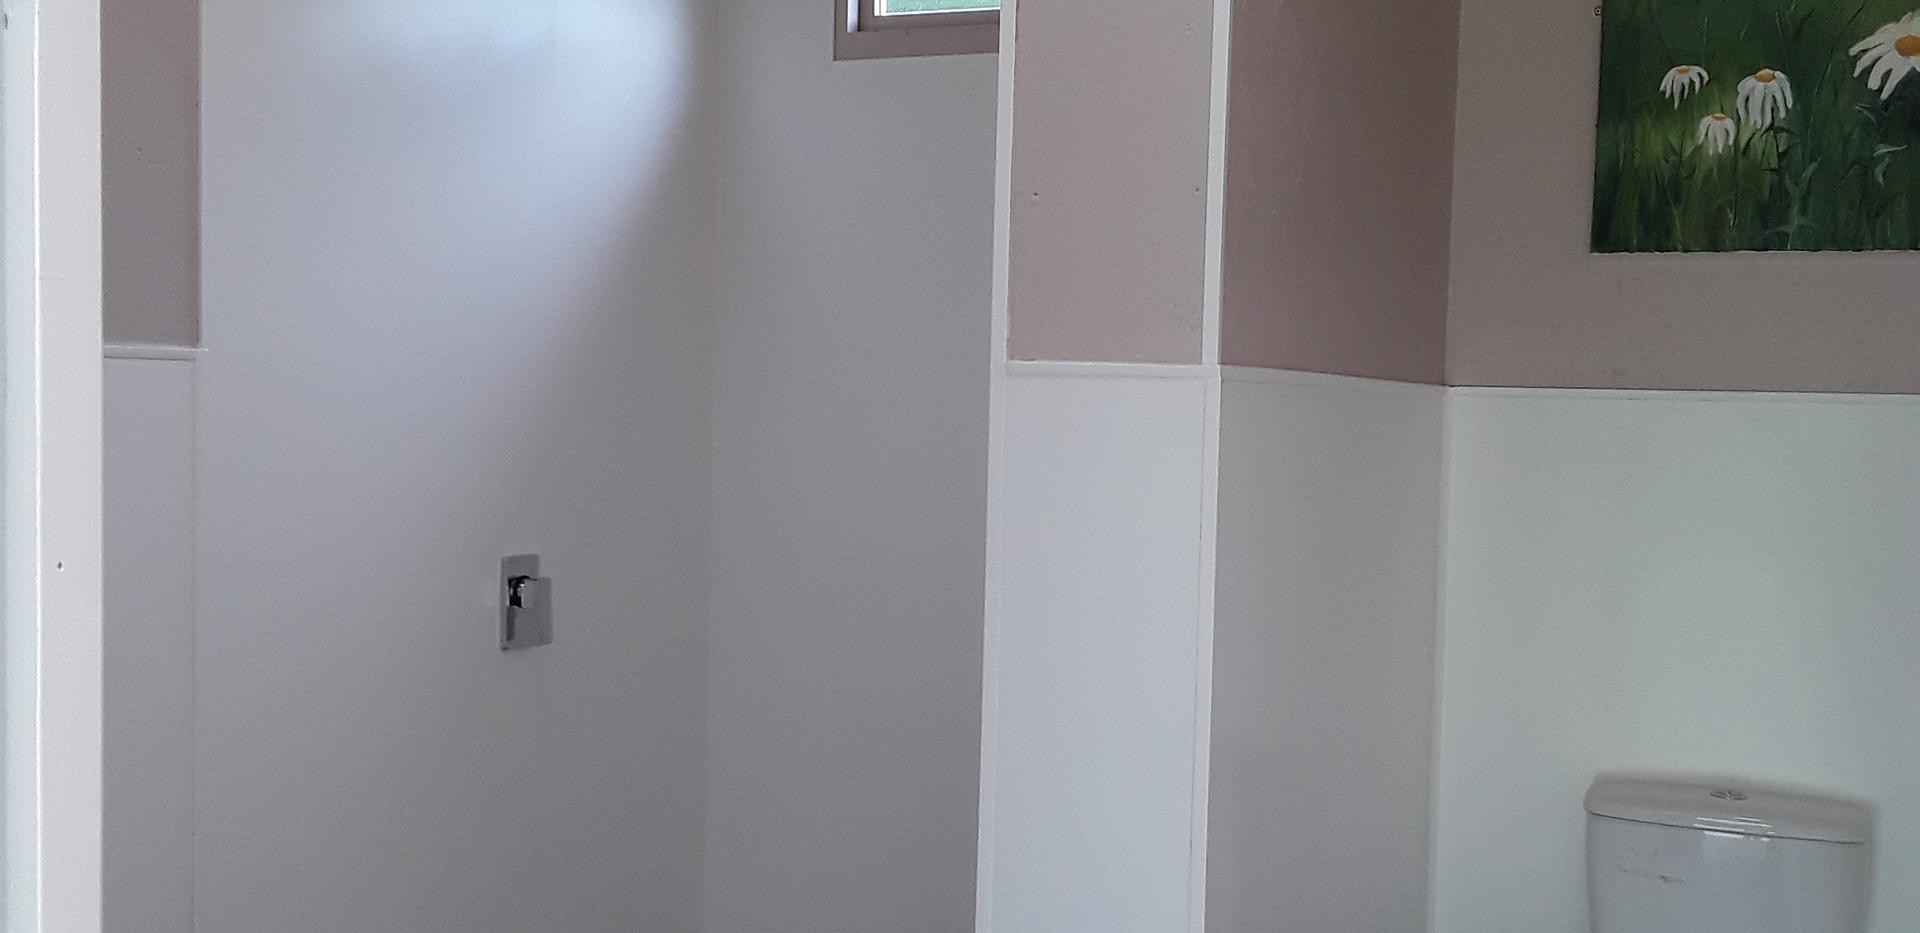 Campsite Toilets